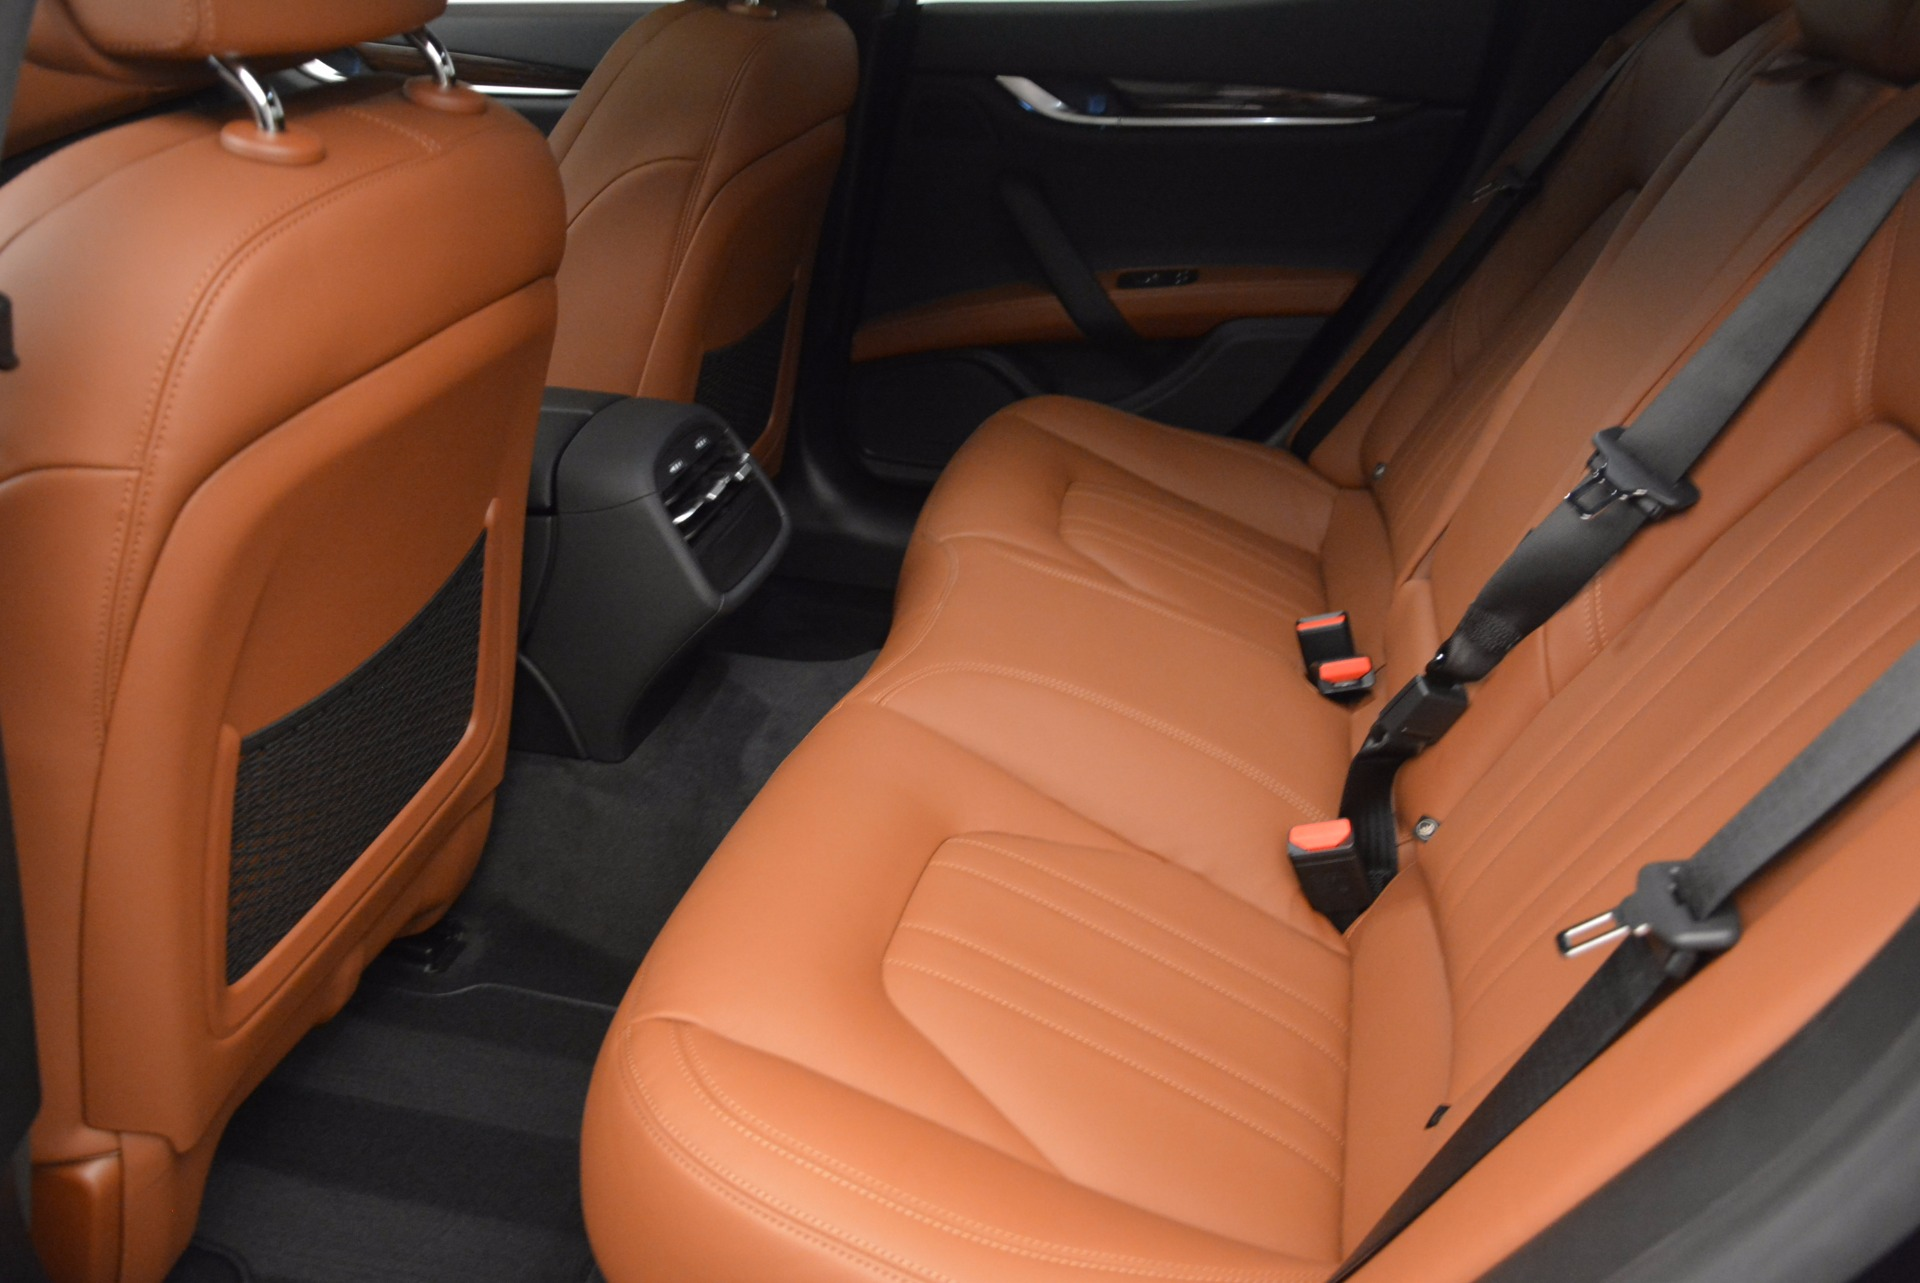 Used 2017 Maserati Ghibli S Q4 For Sale In Greenwich, CT 682_p16